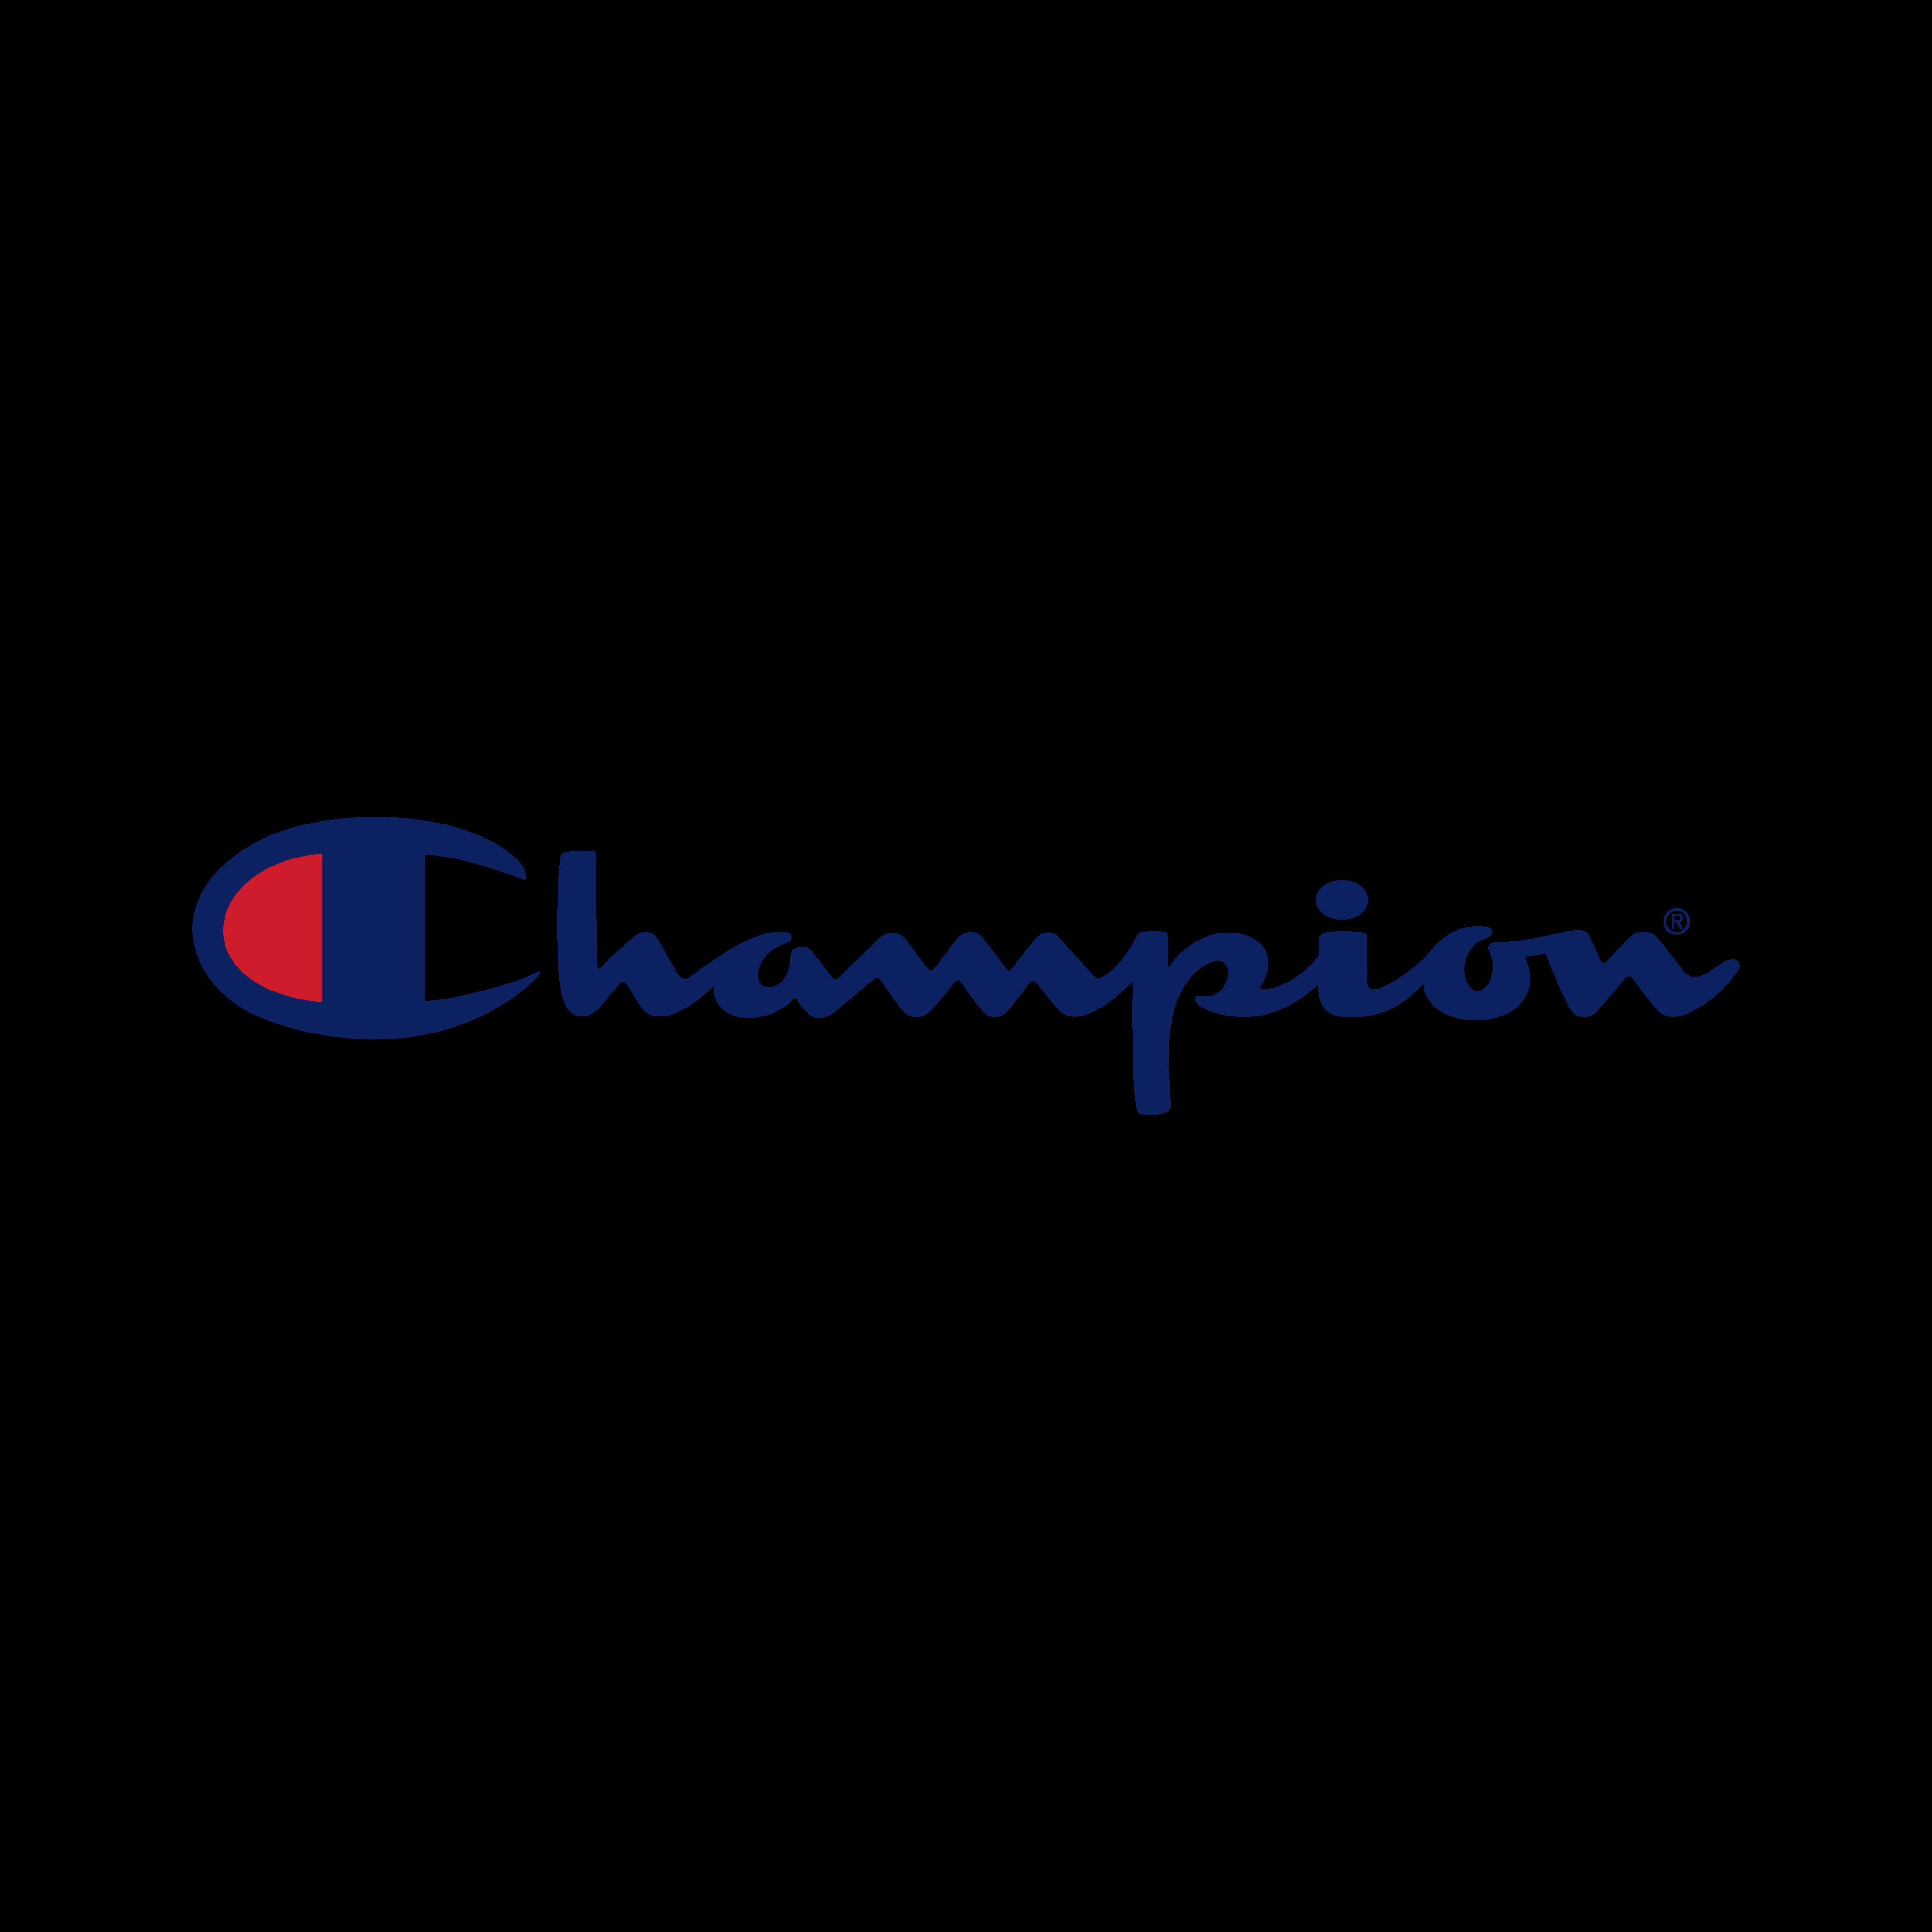 champion logo 0 - Champion Logo